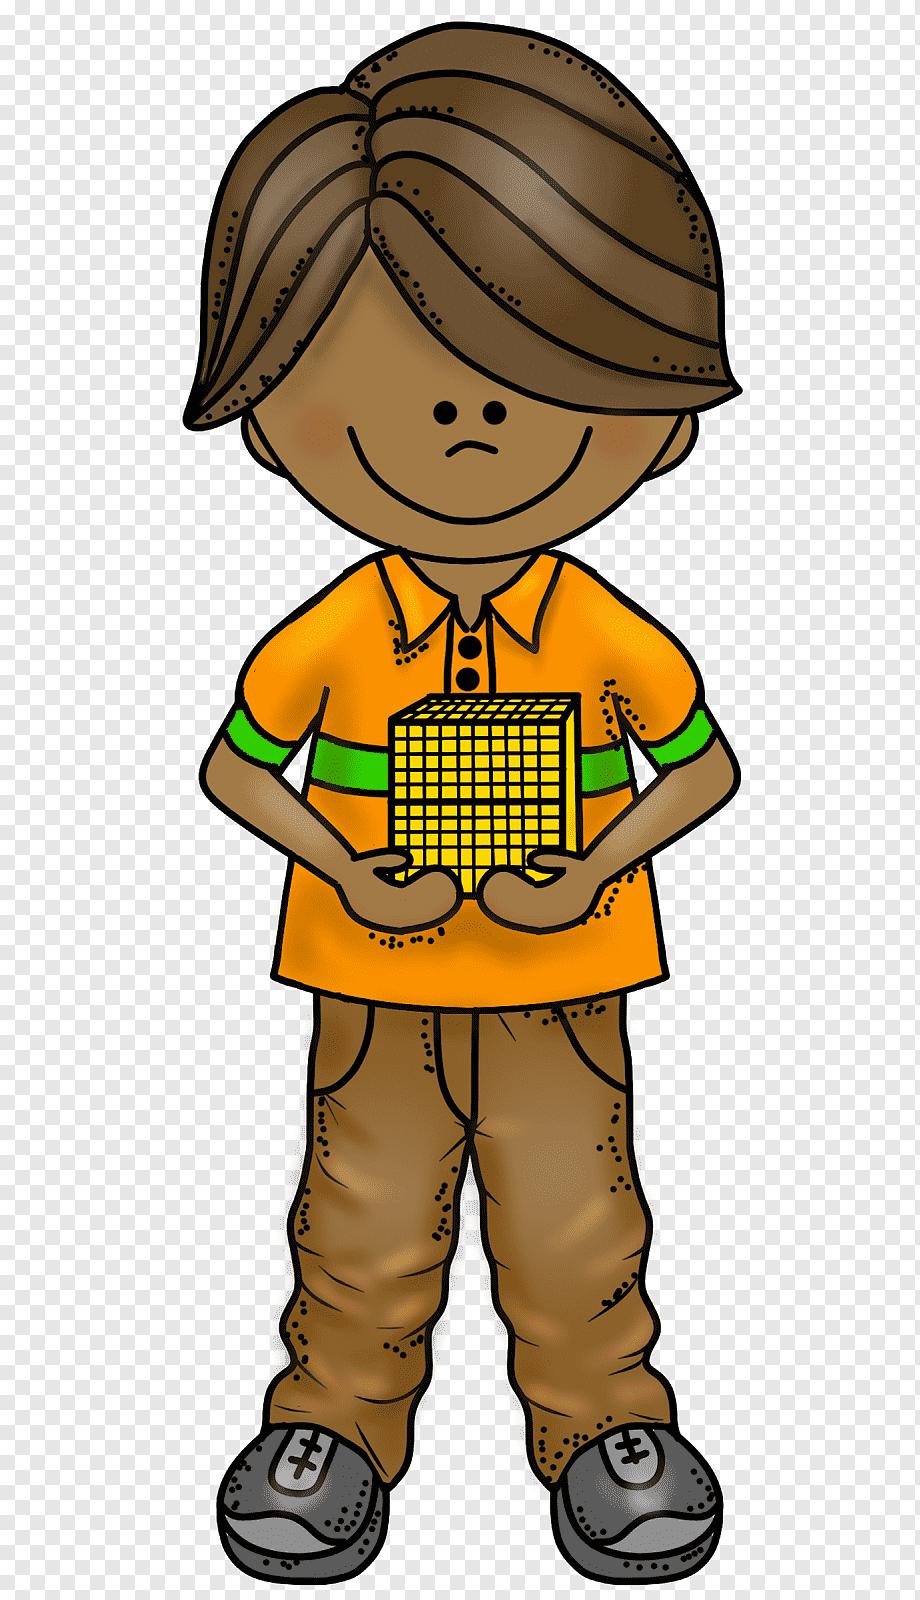 Gambar Kartun Matematika : gambar, kartun, matematika, Menggambar, Matematika,, Laki-laki,, Angka, Numerik,, Kartun, PNGWing